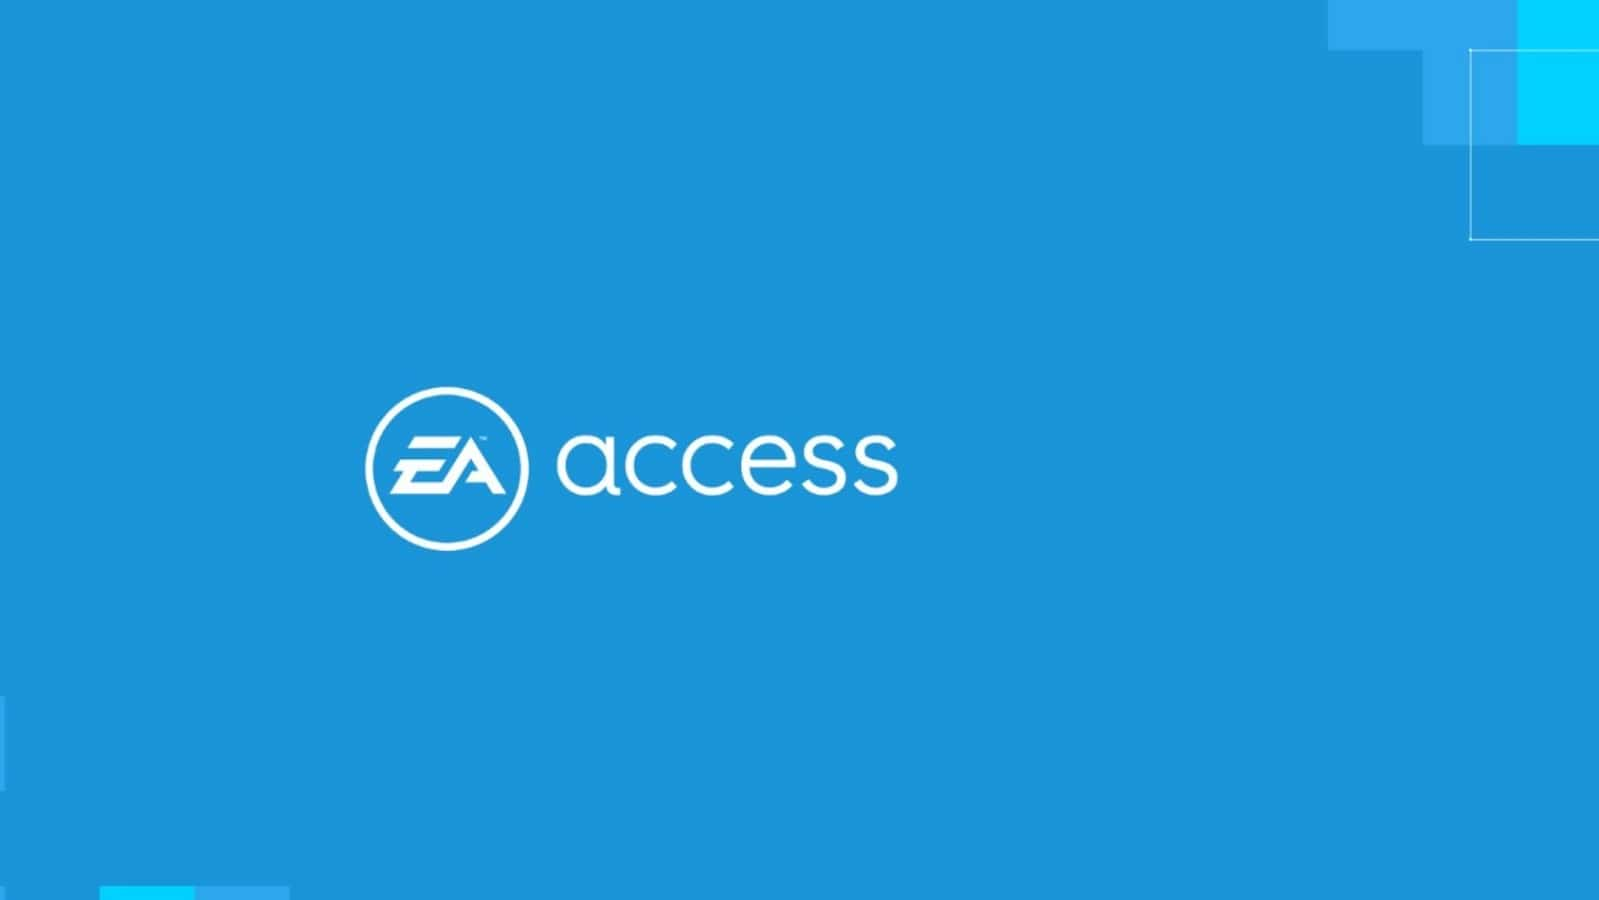 ea access logo on blue background